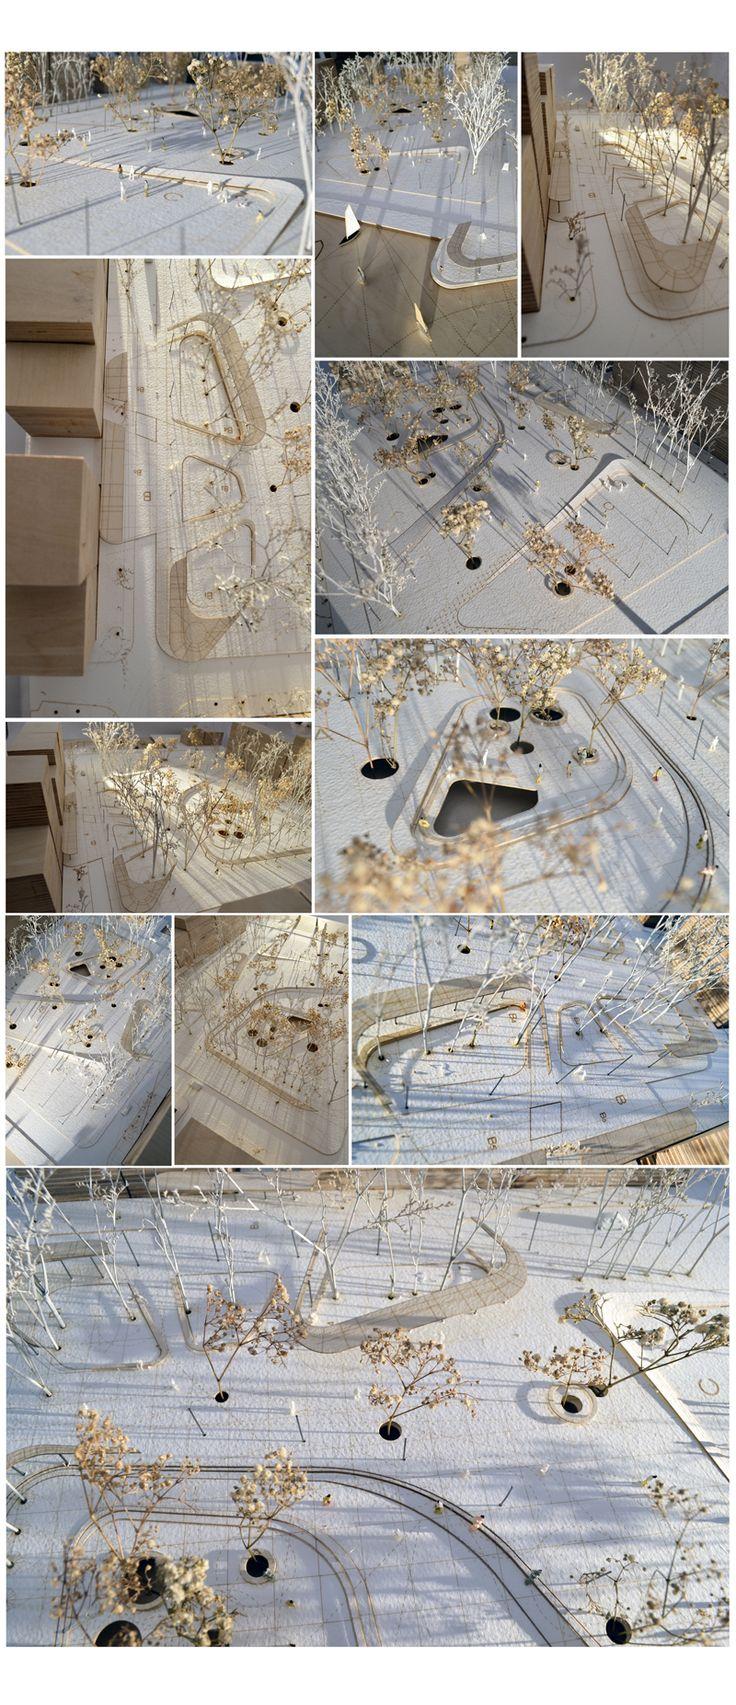 Eleftherias Square, Thessaloniki, GR   draftworks* 2013 Images of model